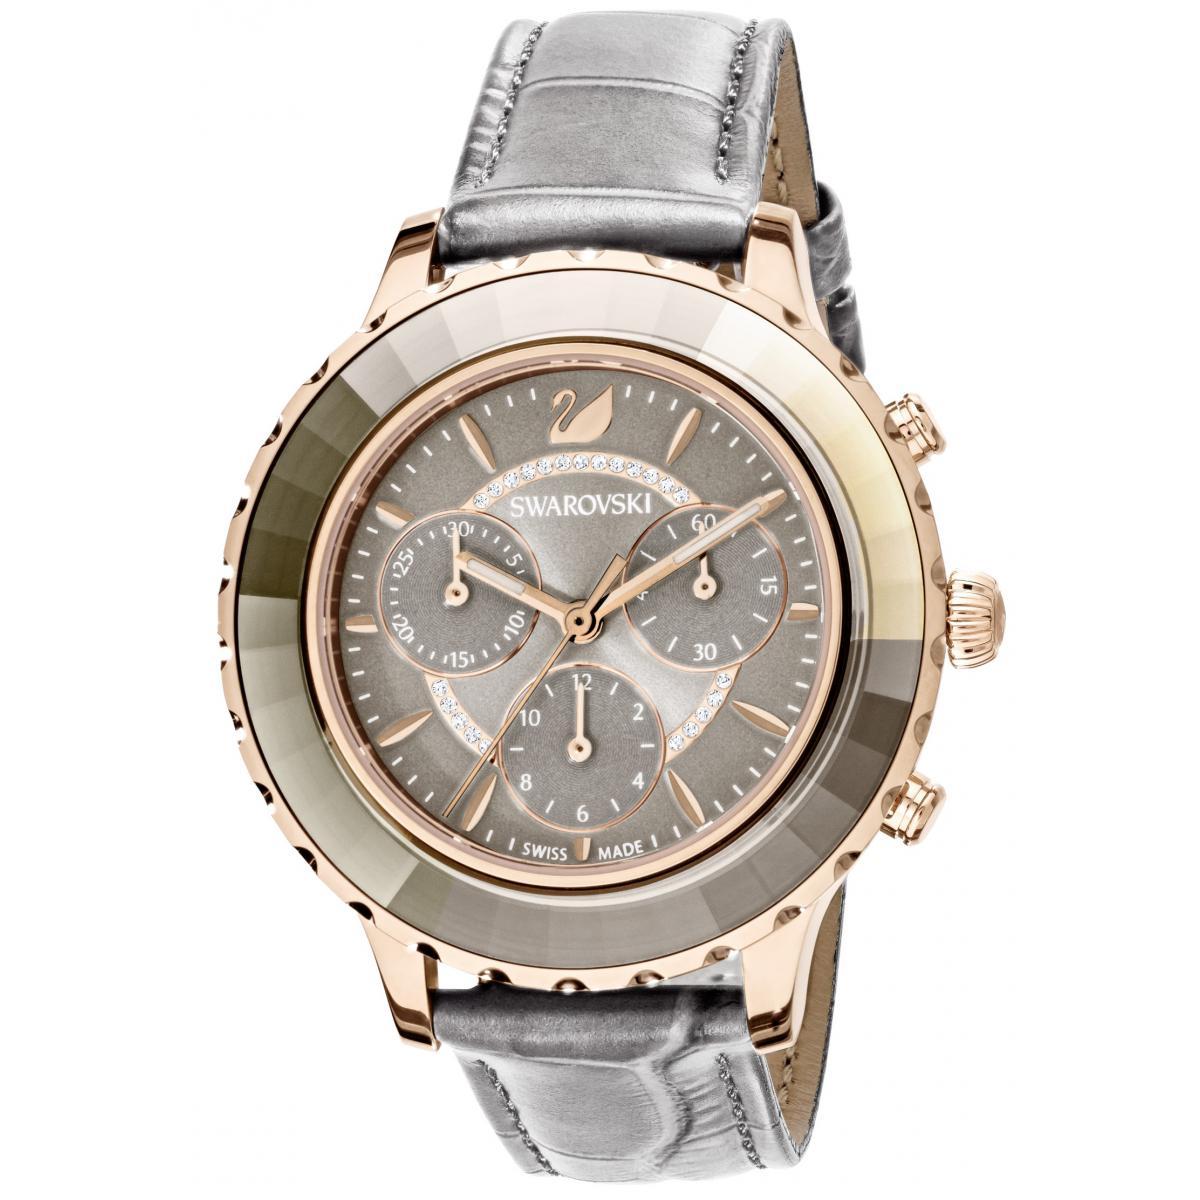 Montre Swarovski Montre 5452495 - Montre Octea Lux Cuir - Swarovski montres - Modalova